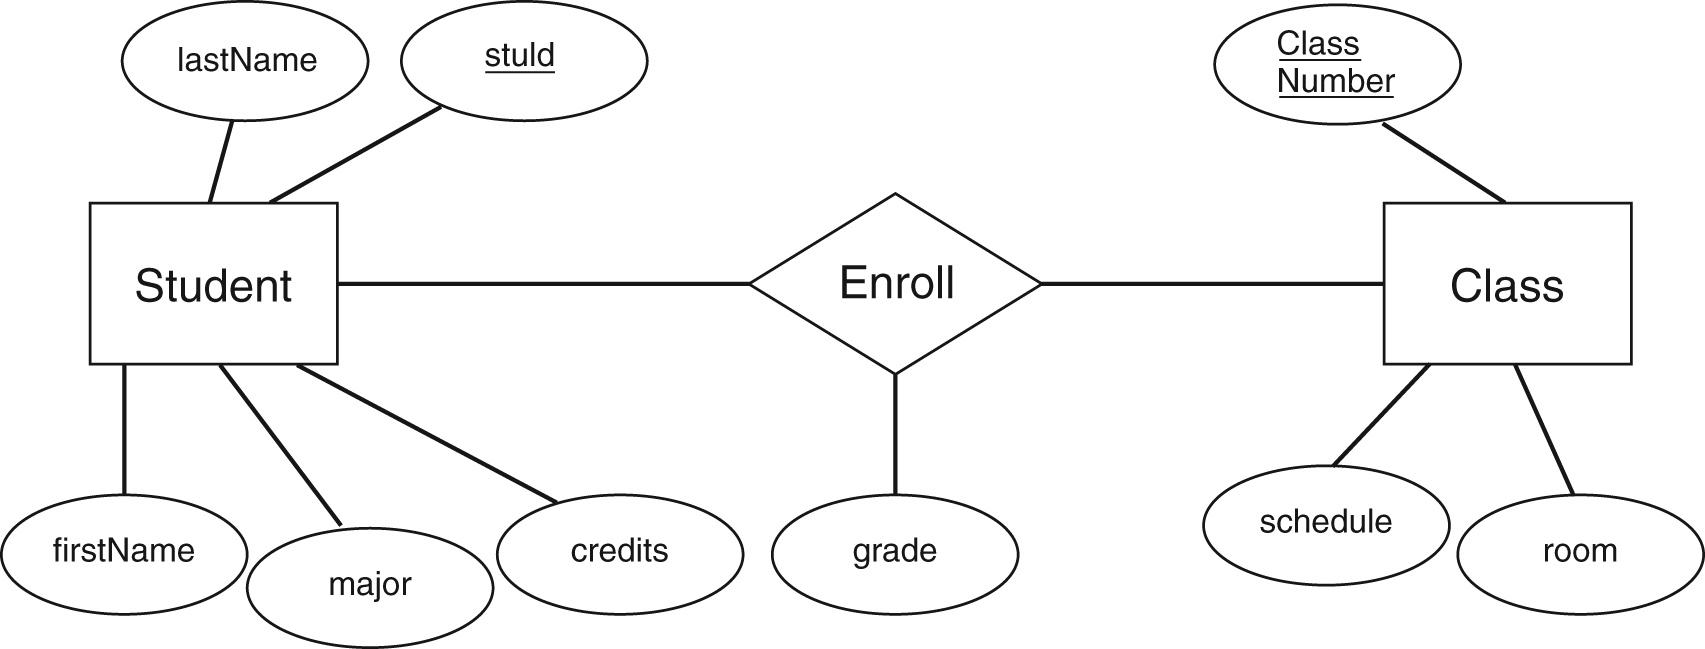 Er Diagram Dbms Examples - 9.ulrich-Temme.de • throughout Simple Er Diagram Examples Ppt